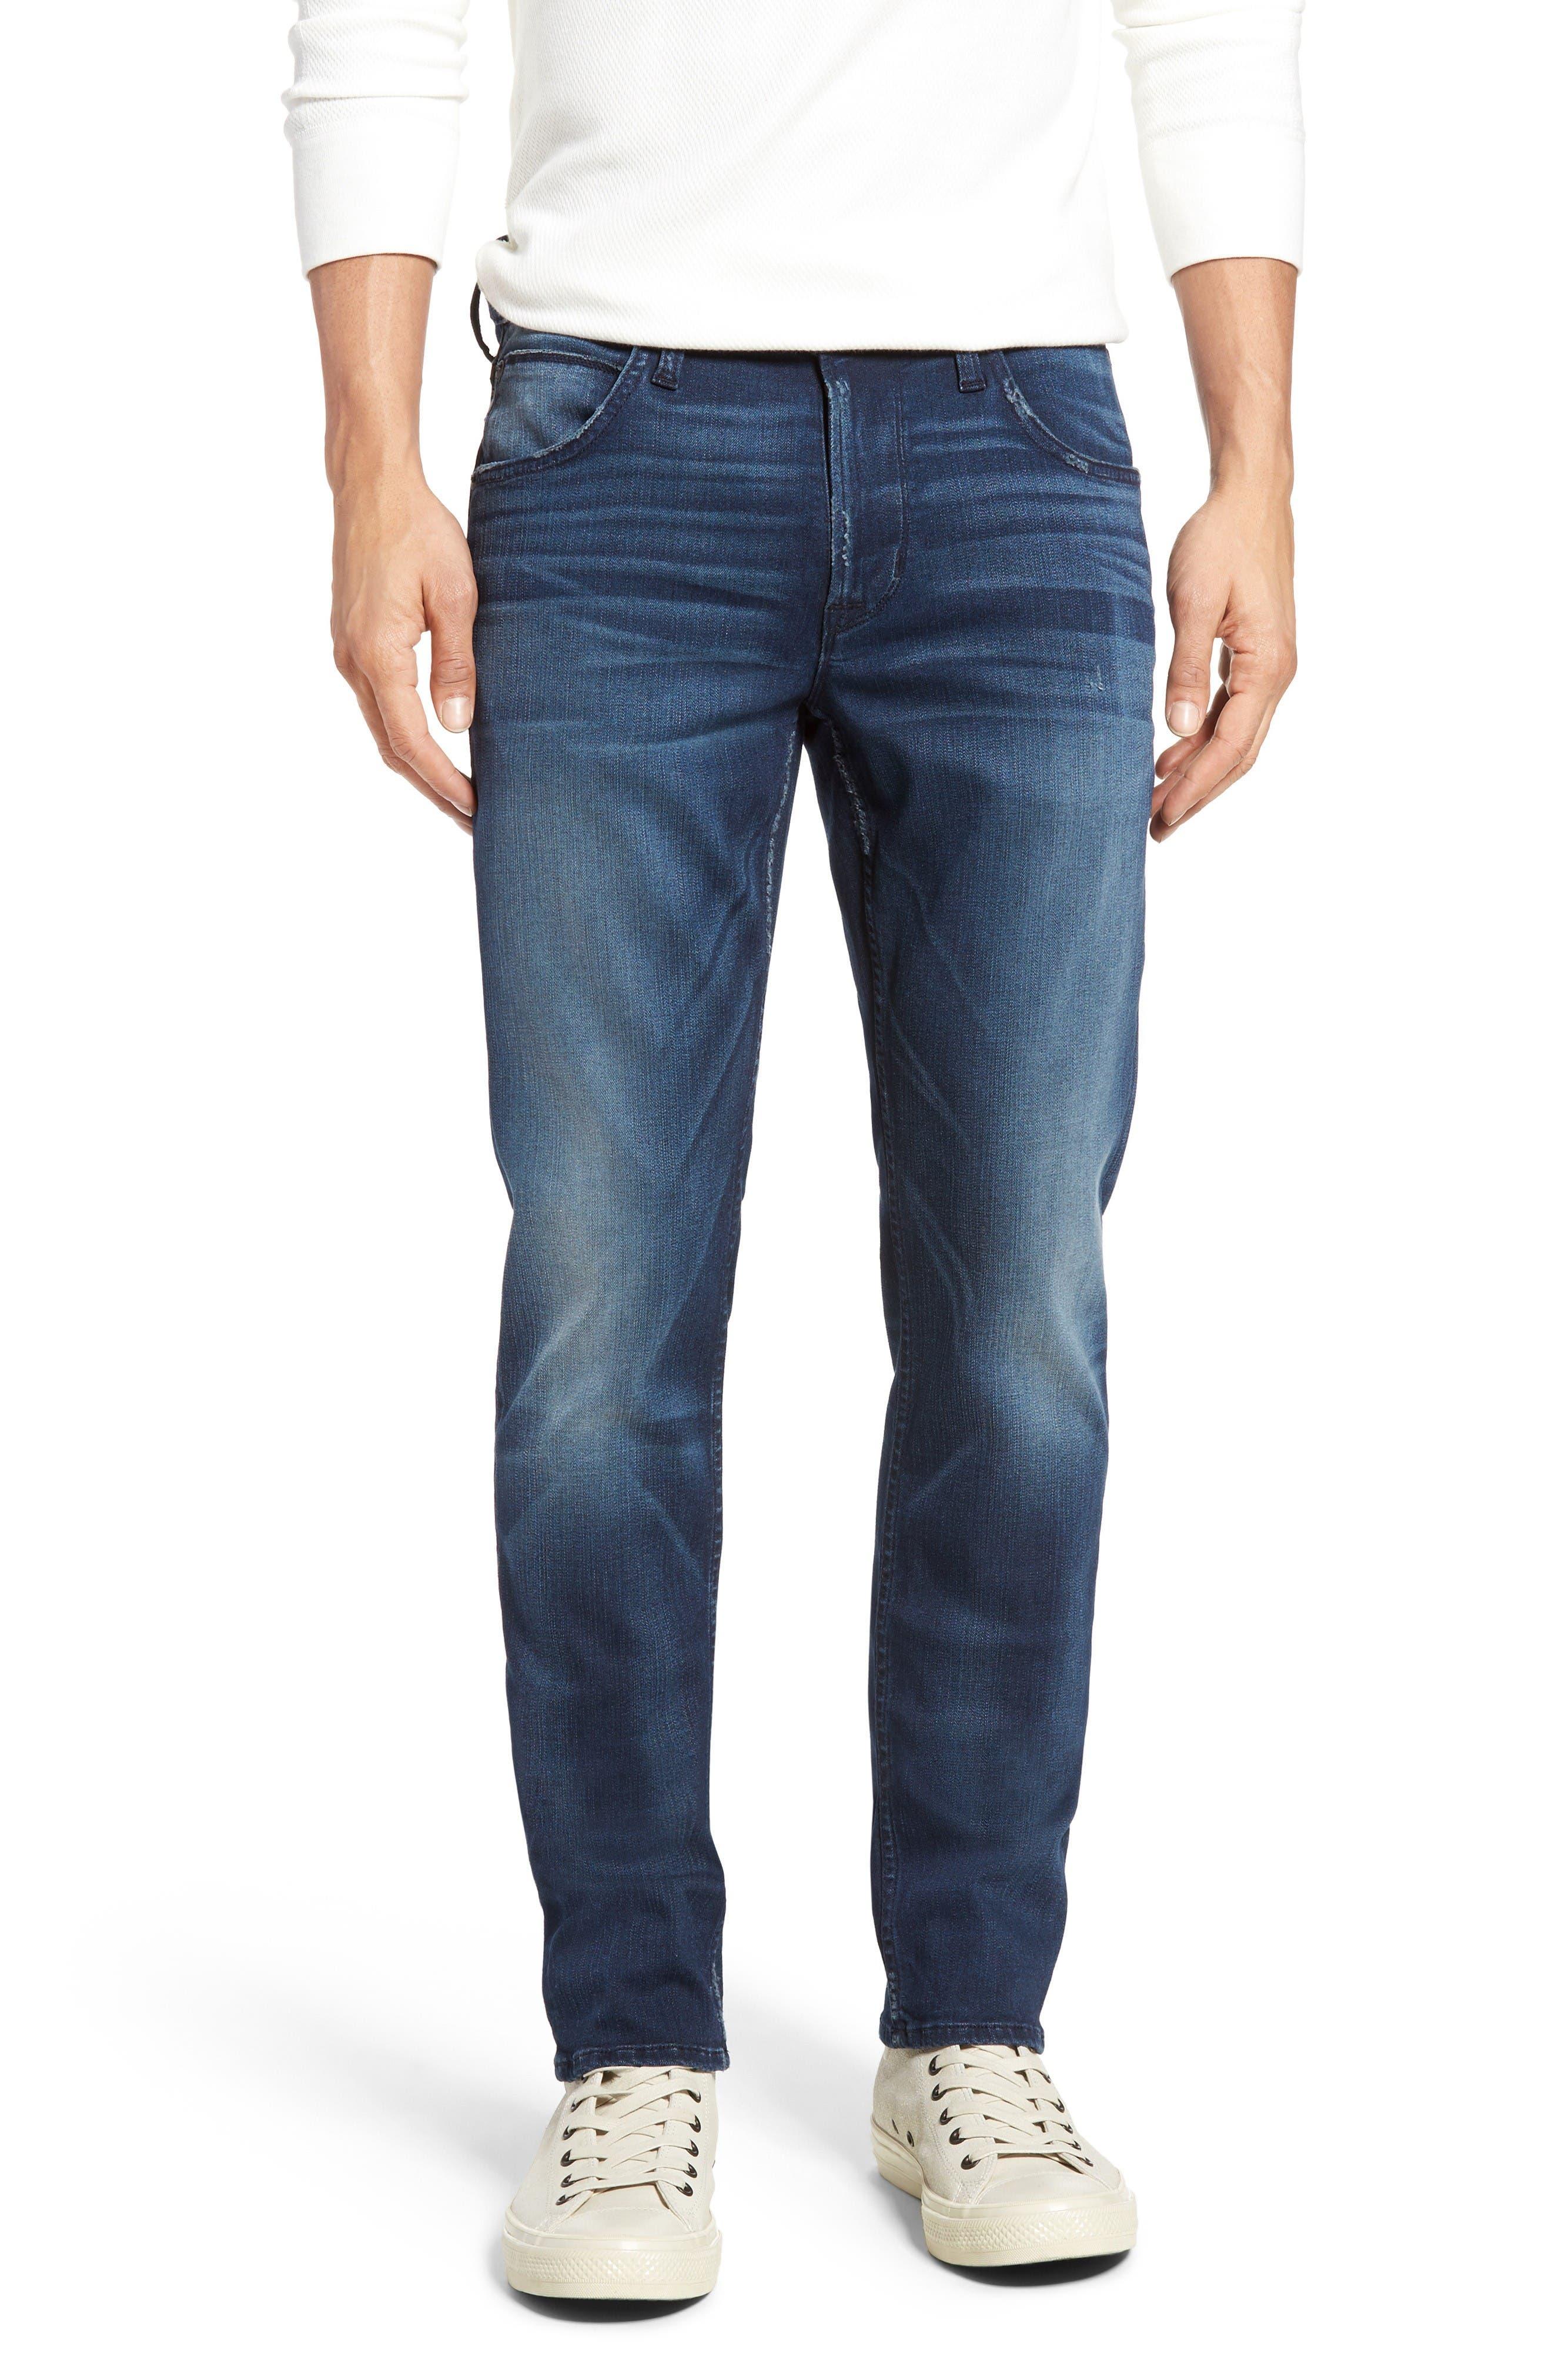 Blake Slim Fit Jeans,                             Main thumbnail 1, color,                             Napoleon Blue